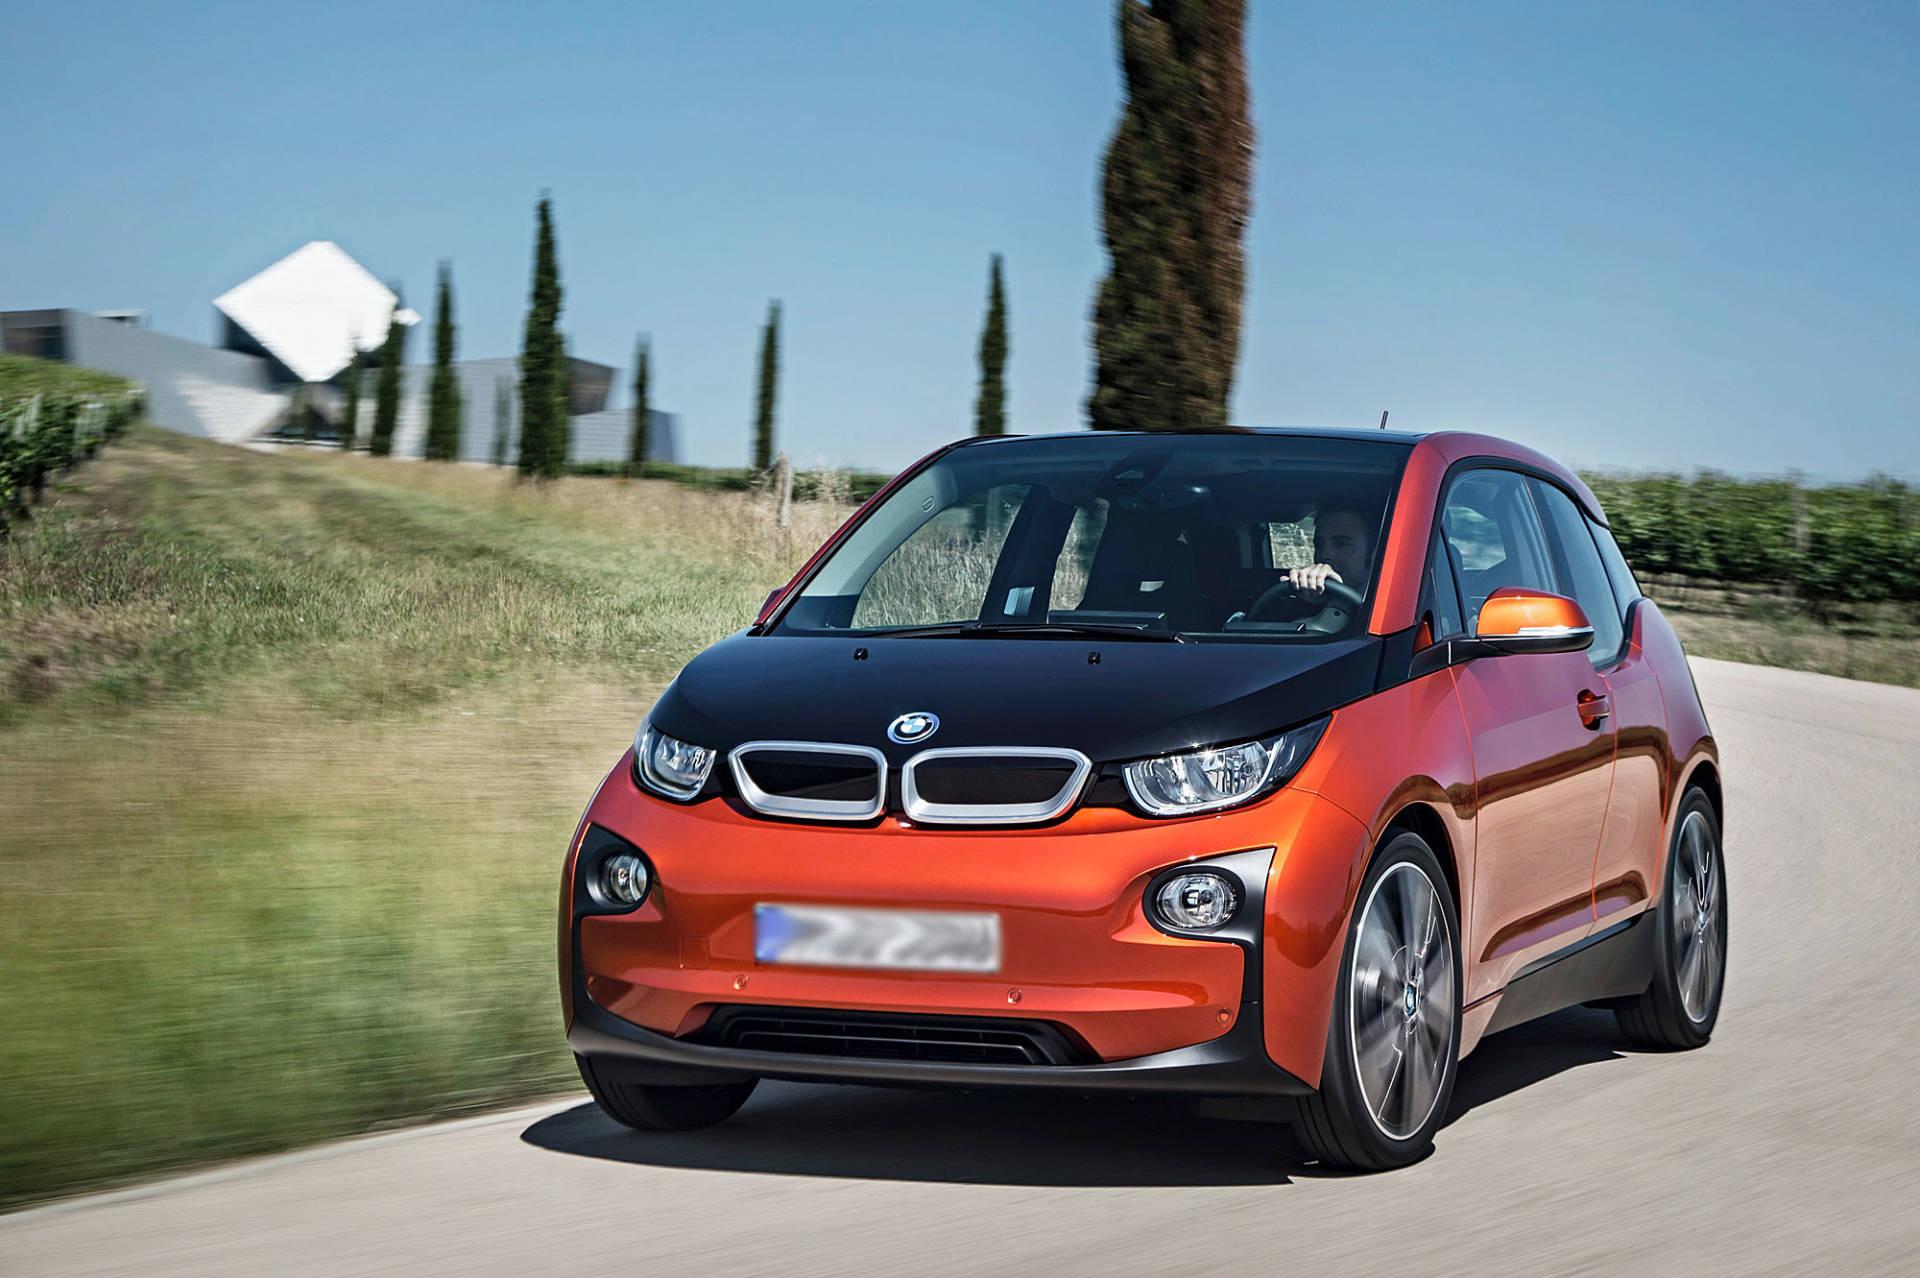 E-Auto mieten: Testbericht über den BMW i3